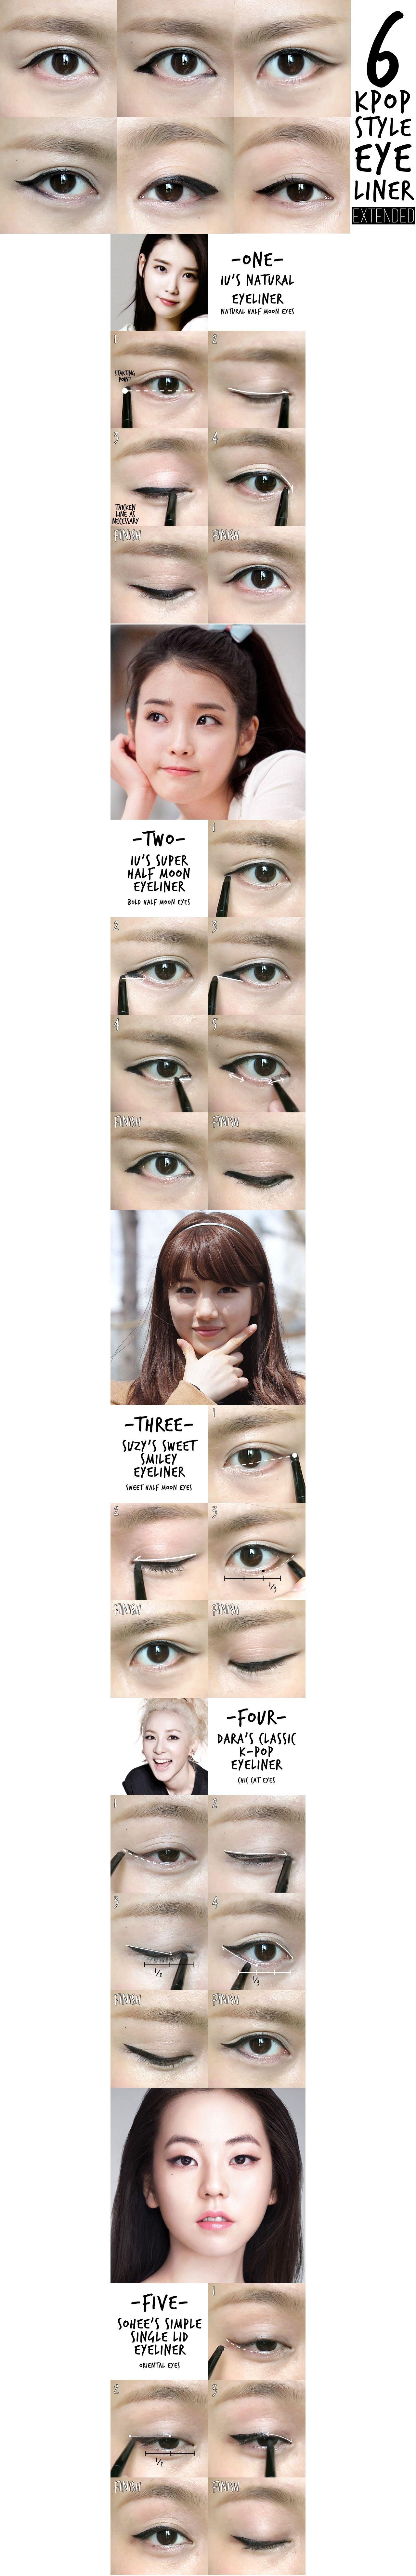 6 k pop eyeliner ⭐️⭐️  #JoinNerium #DebbieKrug #NeriumKorea www.AsianSkincare.Rocke